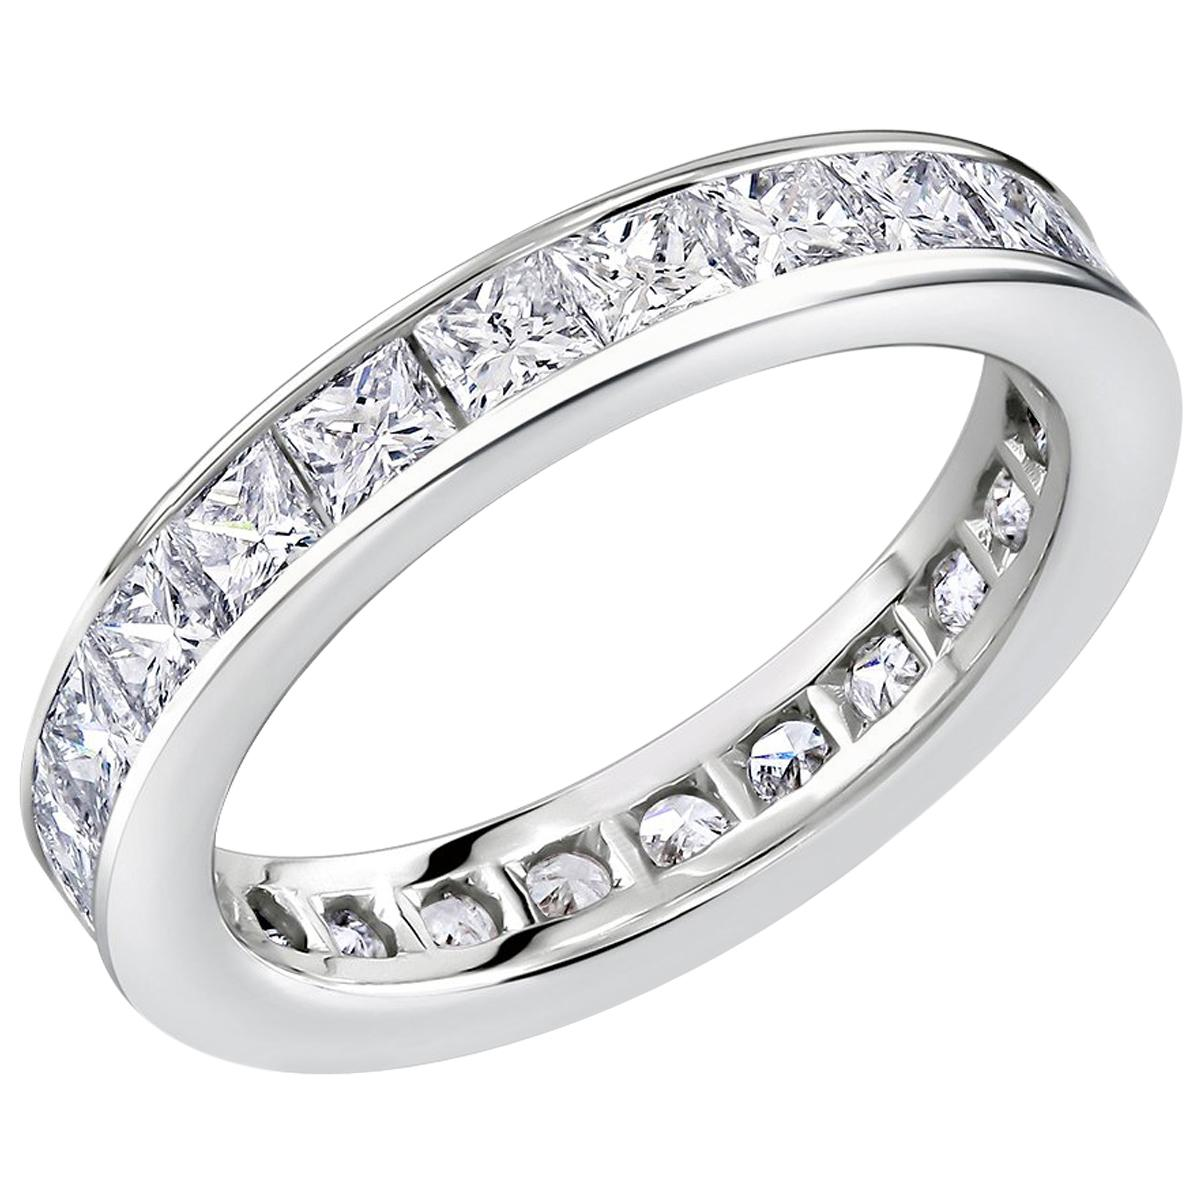 Princess Cut Diamond Eternity Platinum Wedding Band Weighing 2.75 Carat